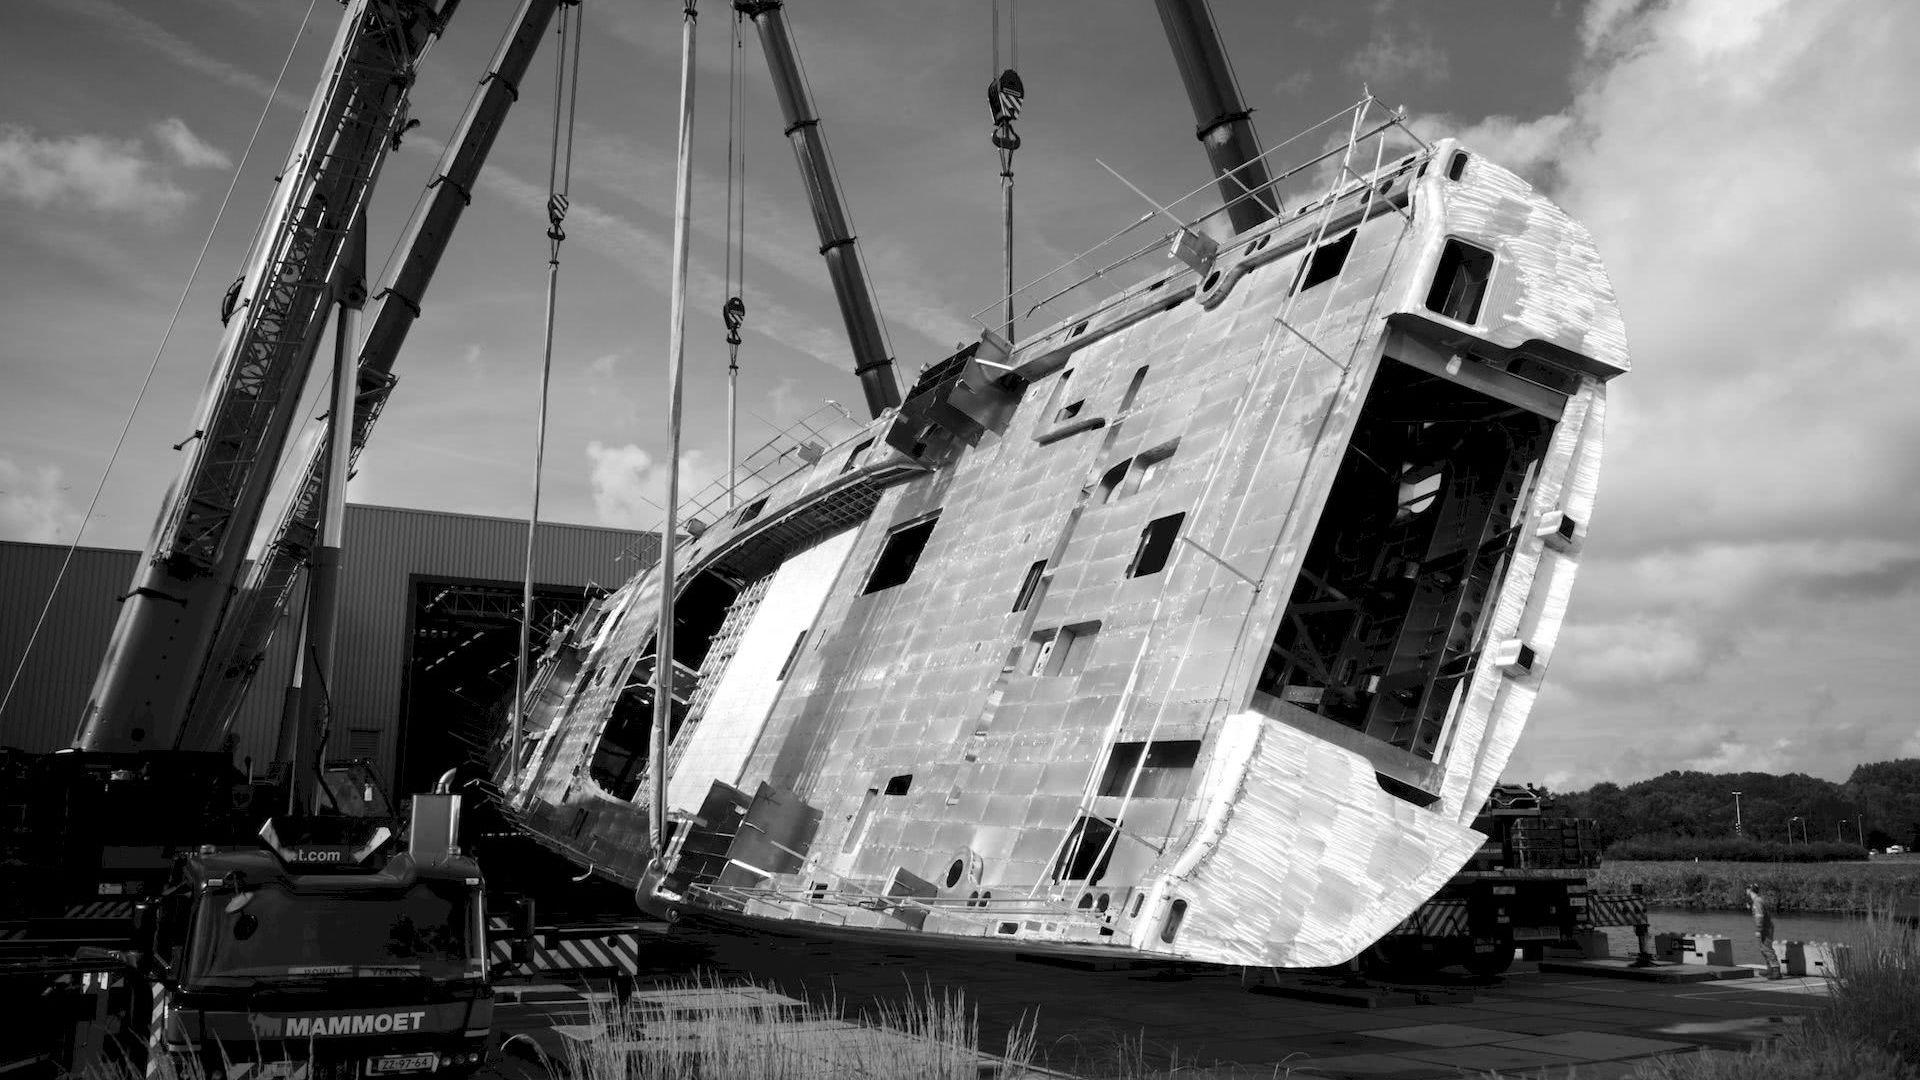 Project 404 Royal huisman Malcolm McKeon Yacht Design